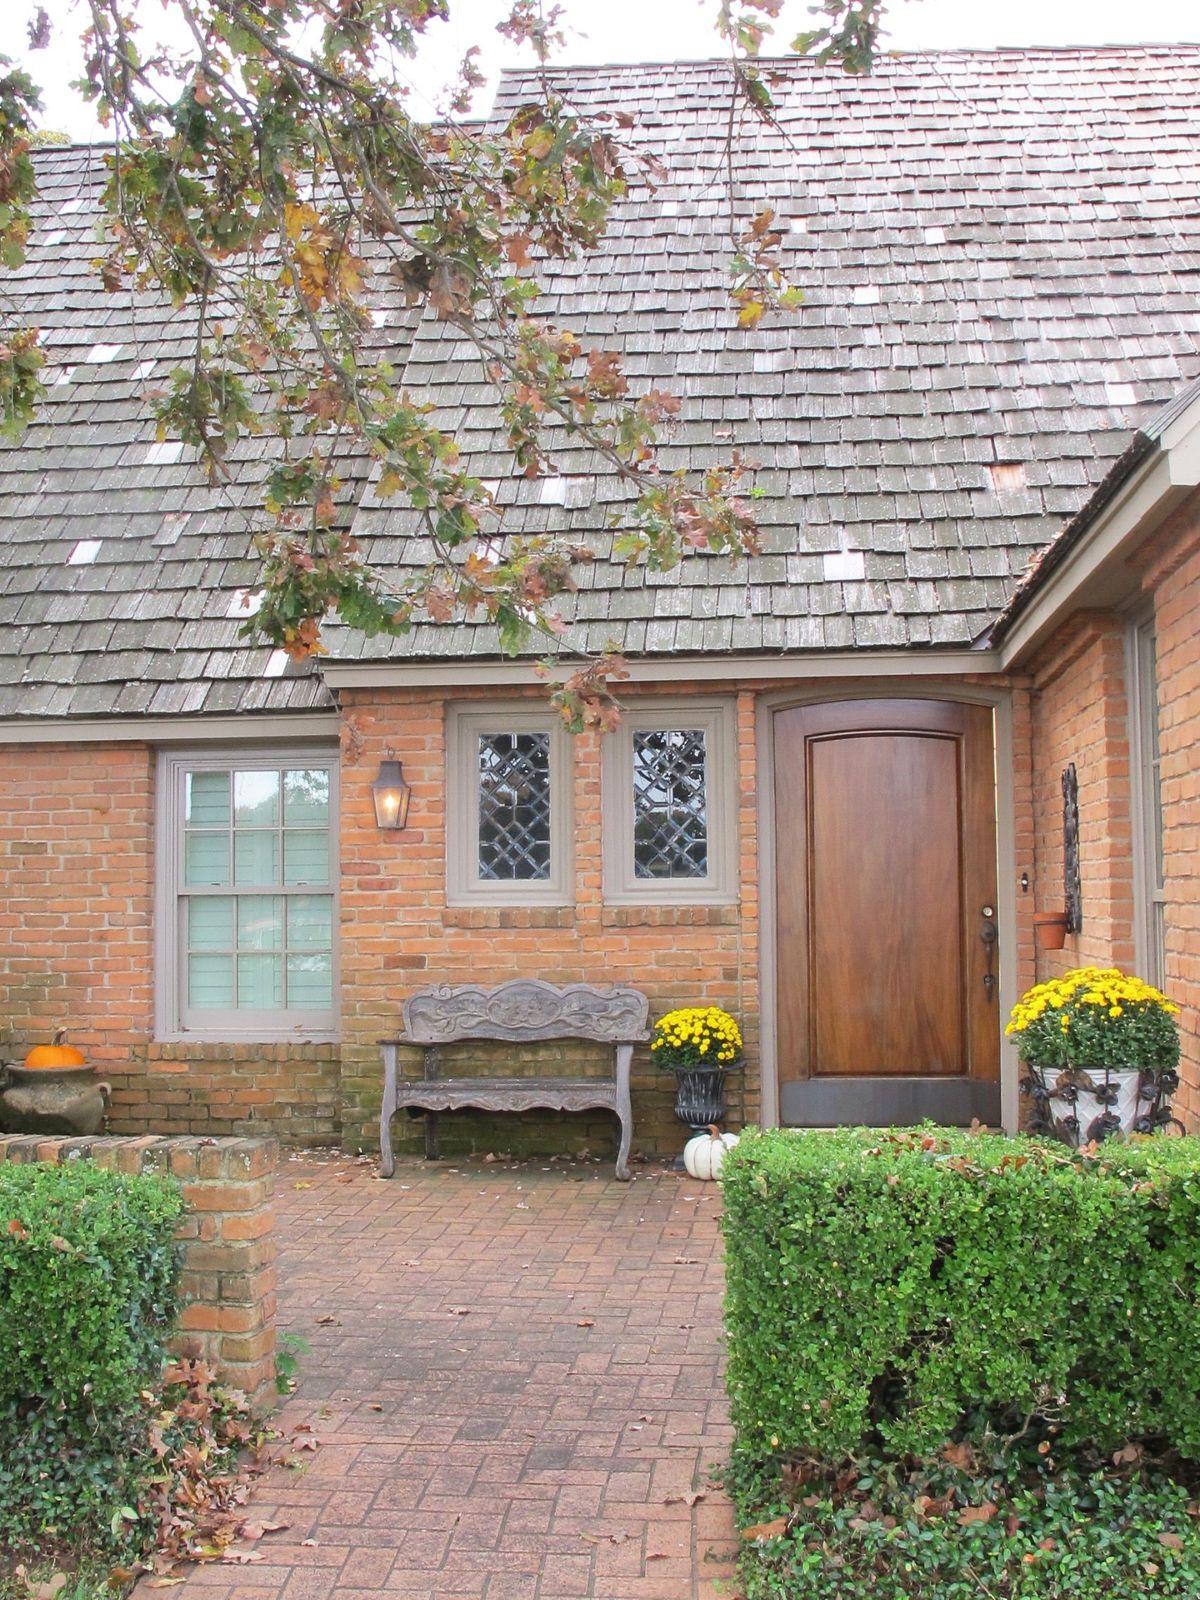 Montana Lakehouse Video Shoot Location Homes Dallas 29.jpg